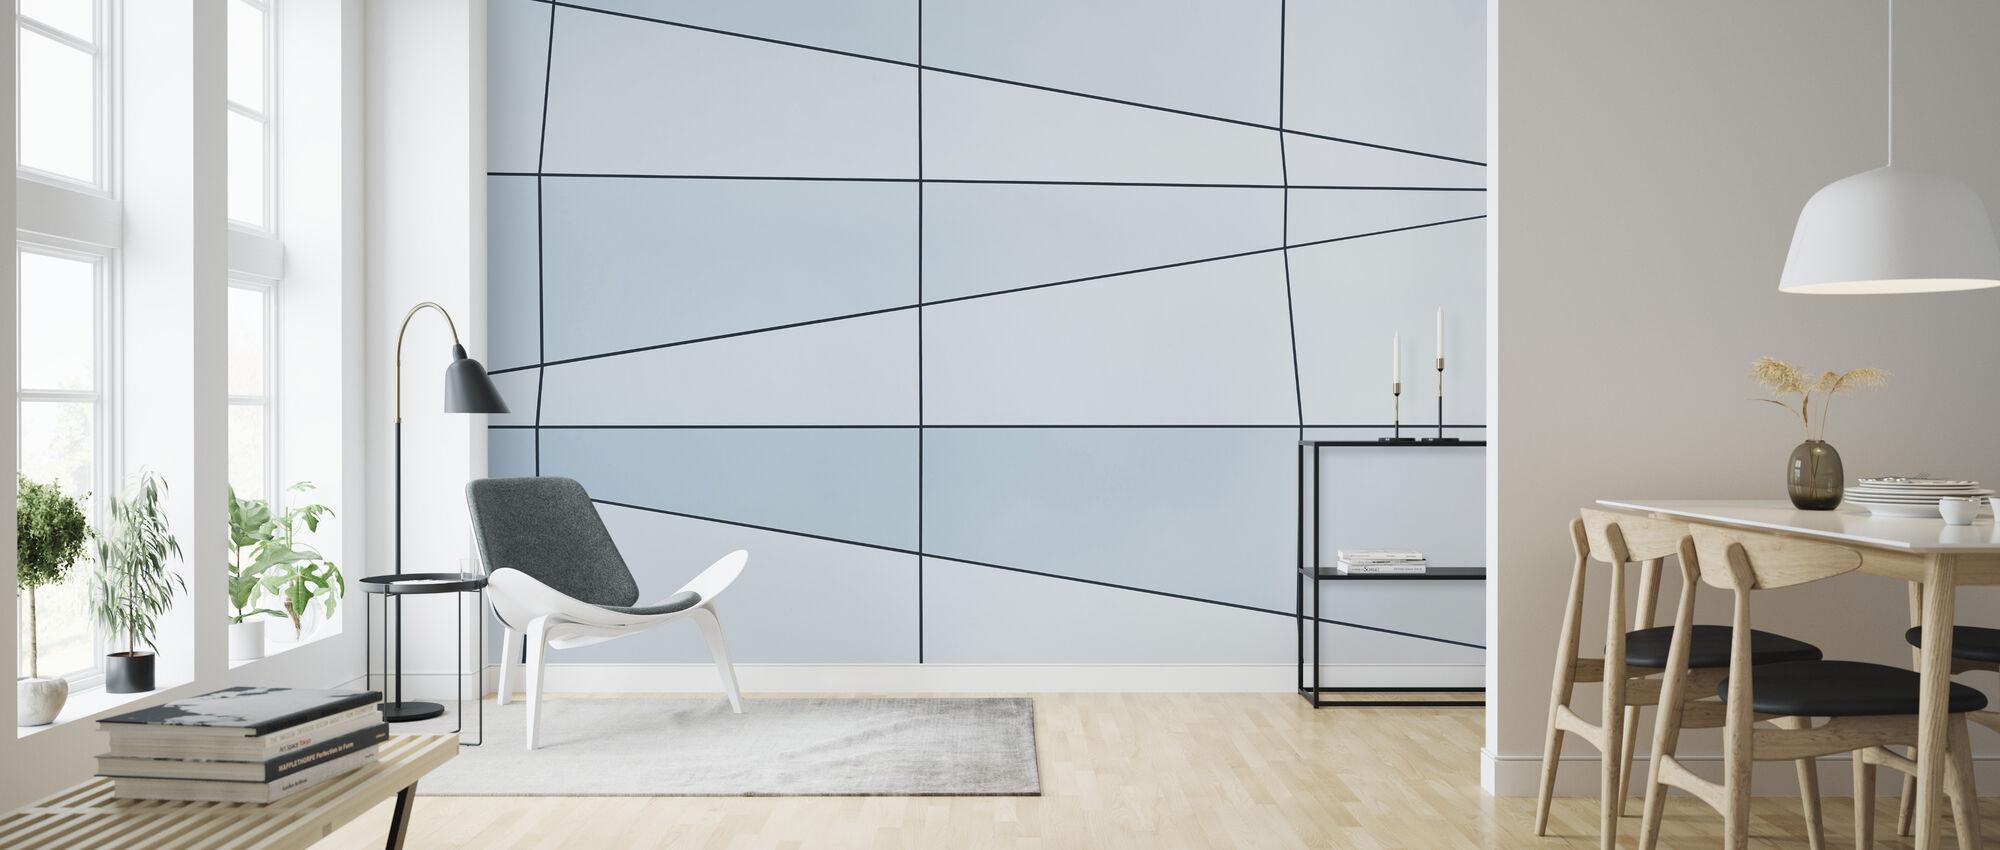 Lines - Wallpaper - Living Room